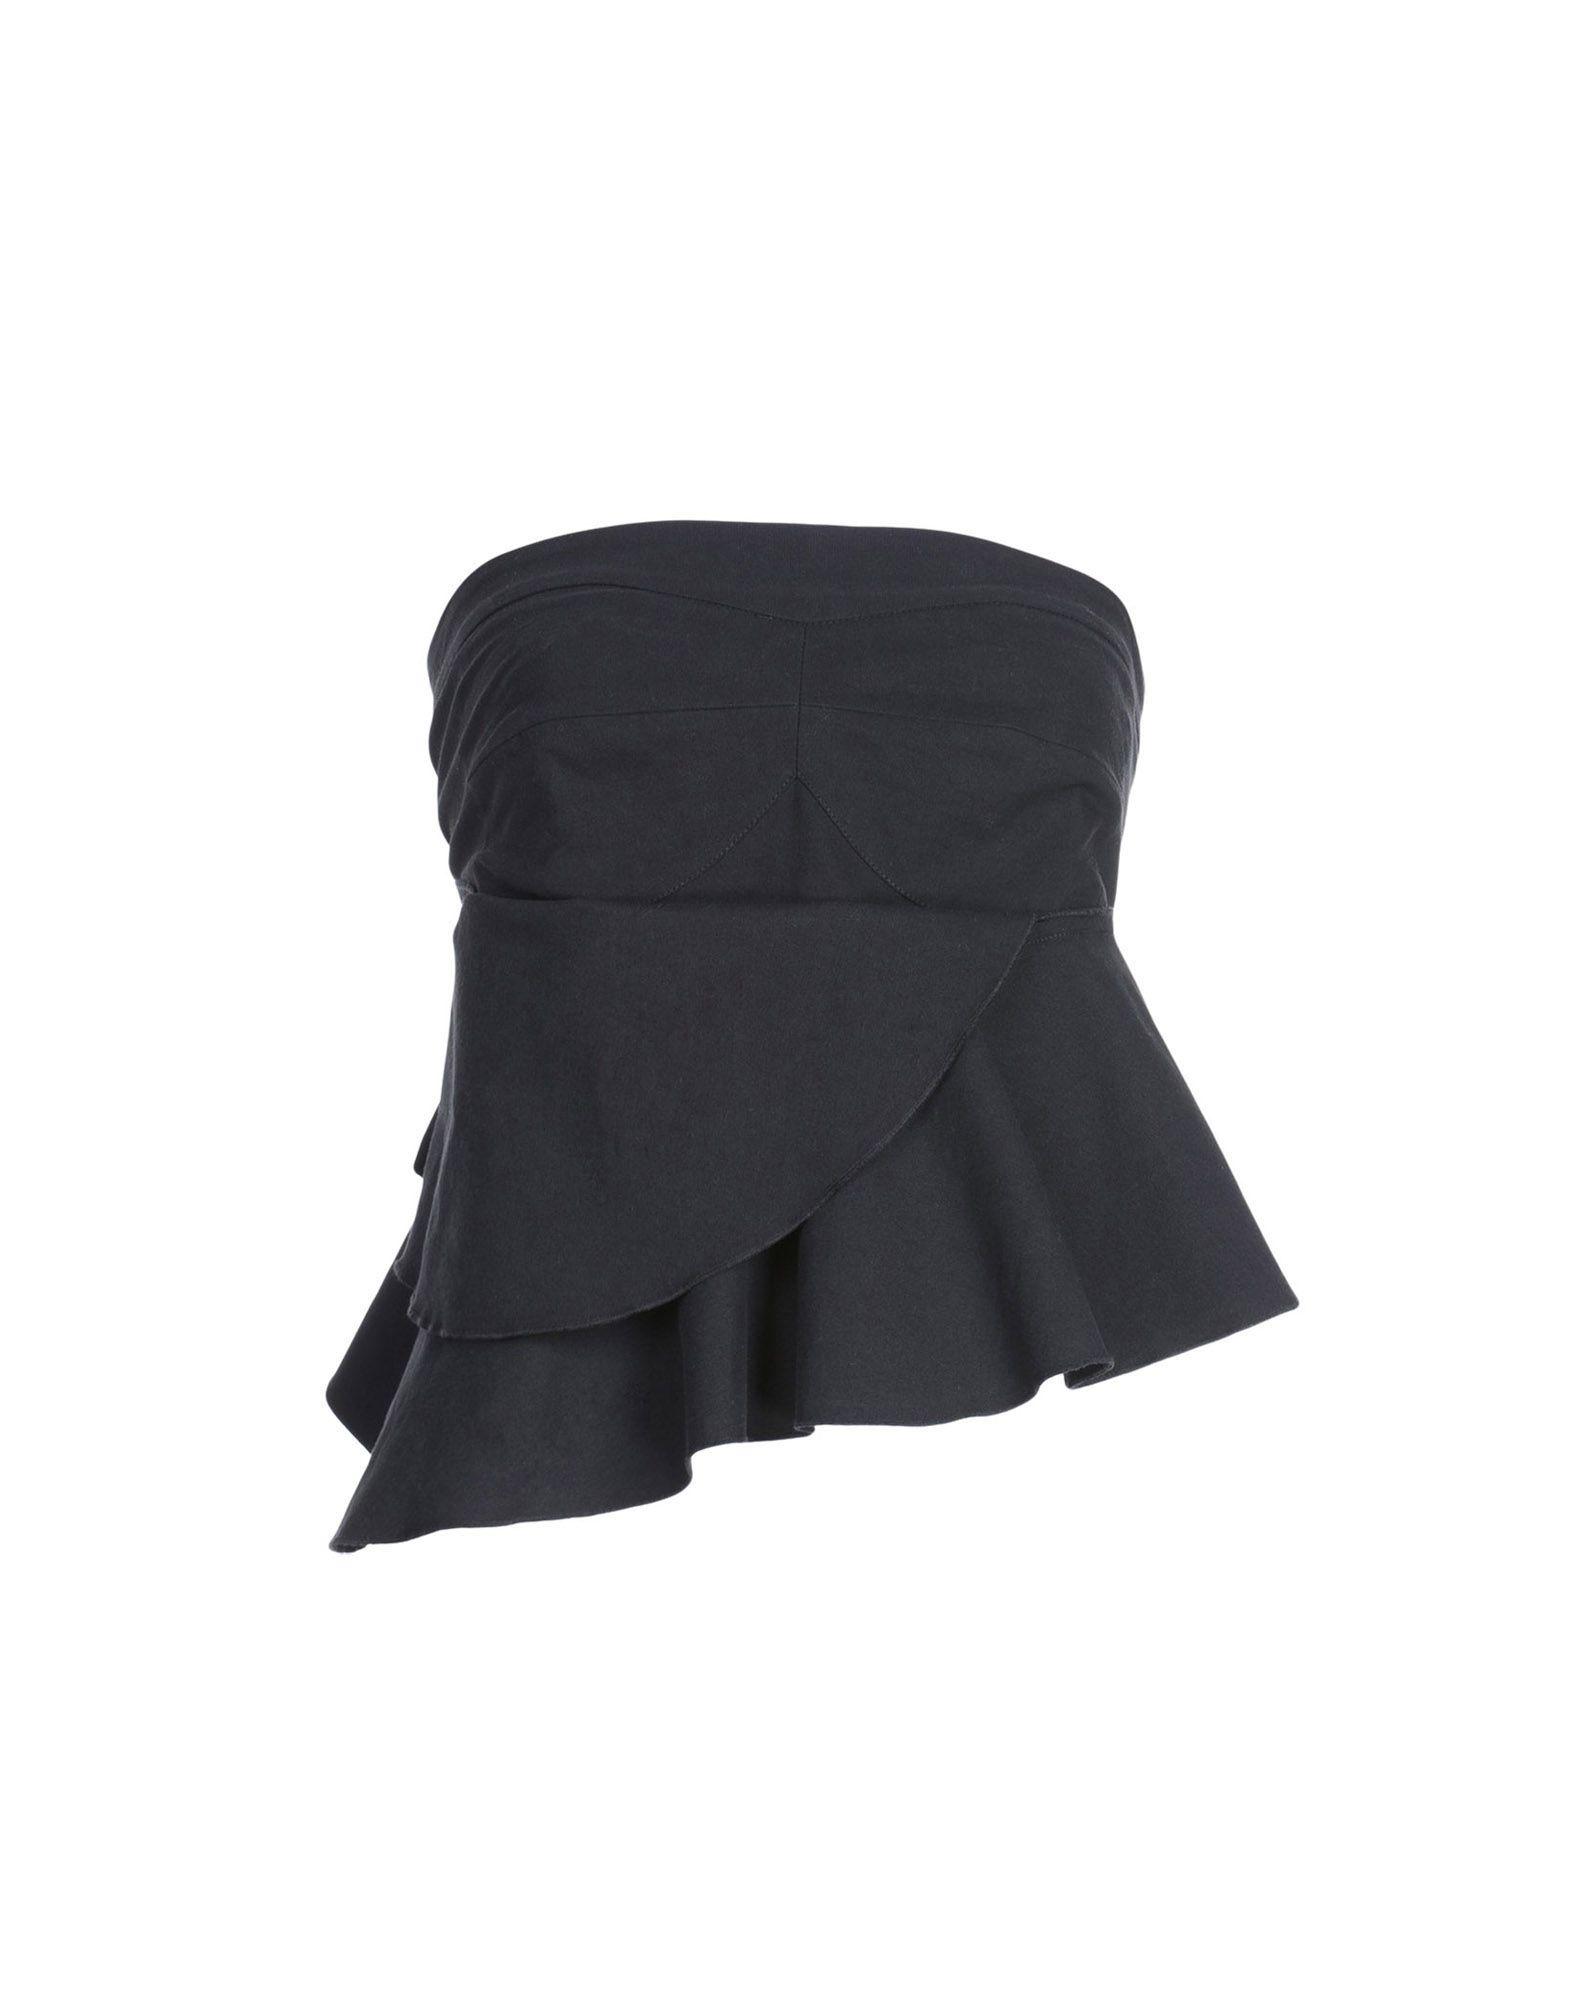 ISABEL MARANT Tube tops. plain weave, no appliqués, basic solid color, deep neckline, one-shoulder, front closure, hook-and-eye closure, no pockets. 70% Cotton, 29% Viscose, 1% Elastane